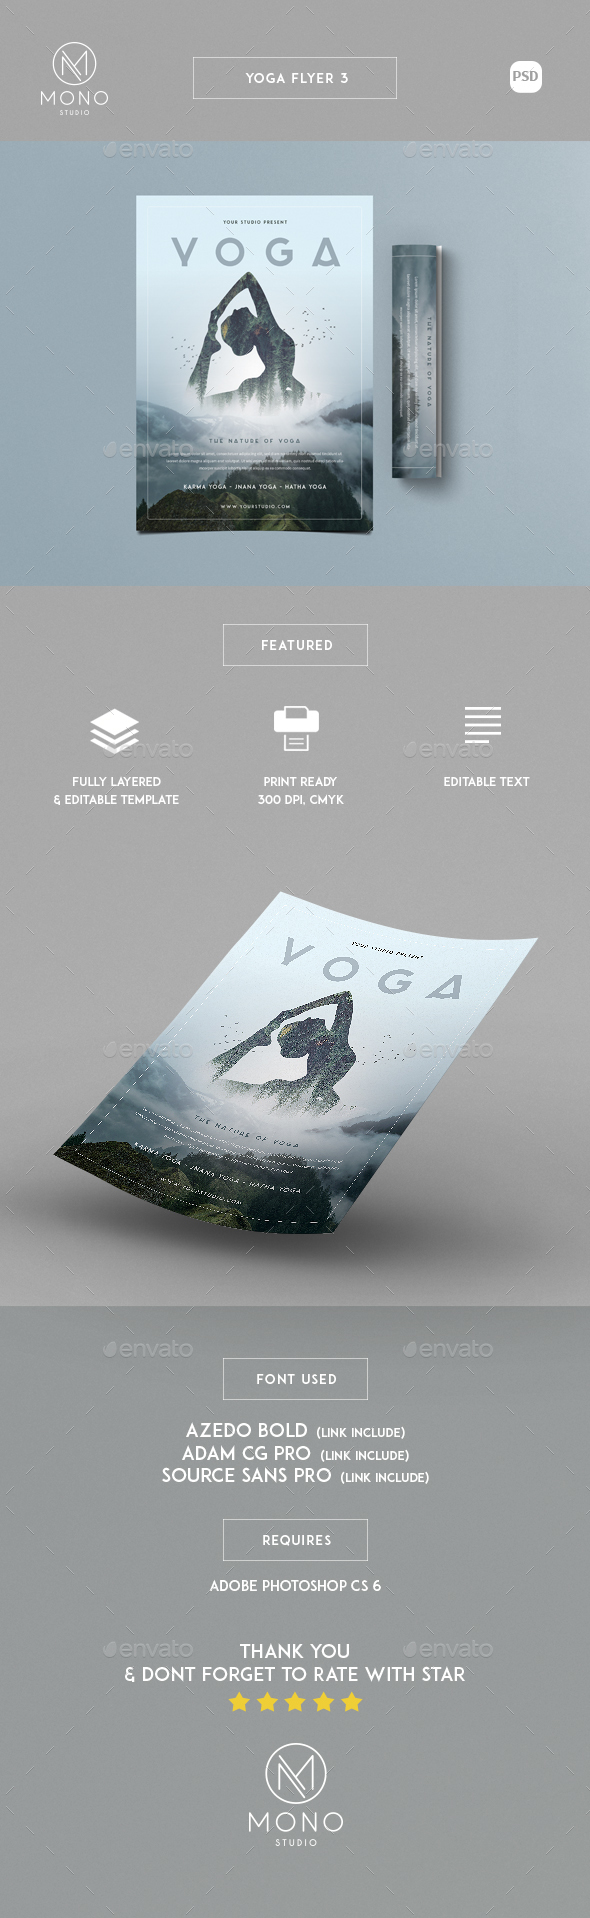 Yoga Flyer 3 - Sports Events